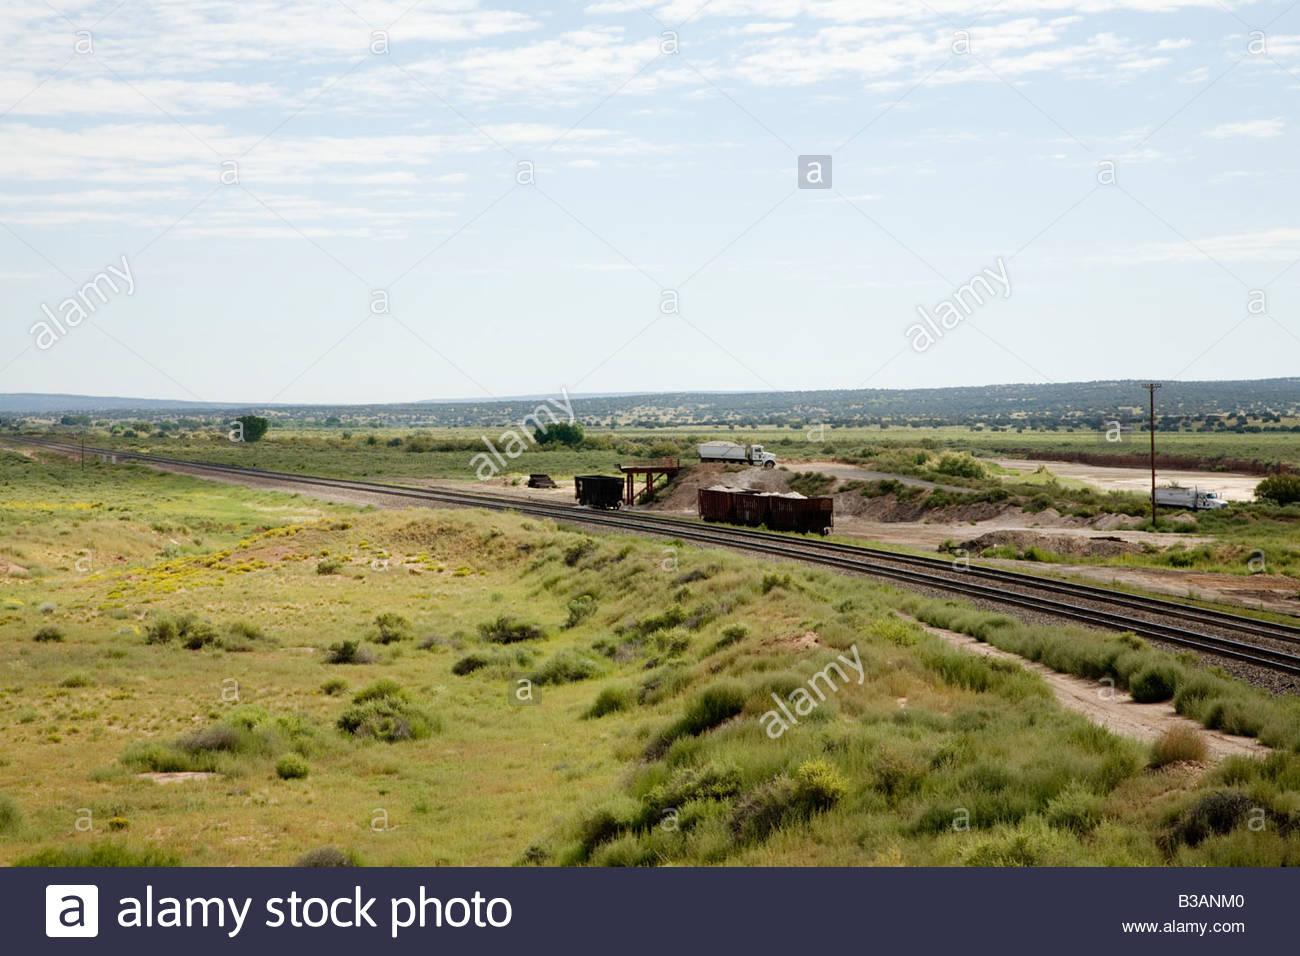 Truck dumping clay railcar dump dumptruck railroad loading car industrial minerals mining trucks - Stock Image